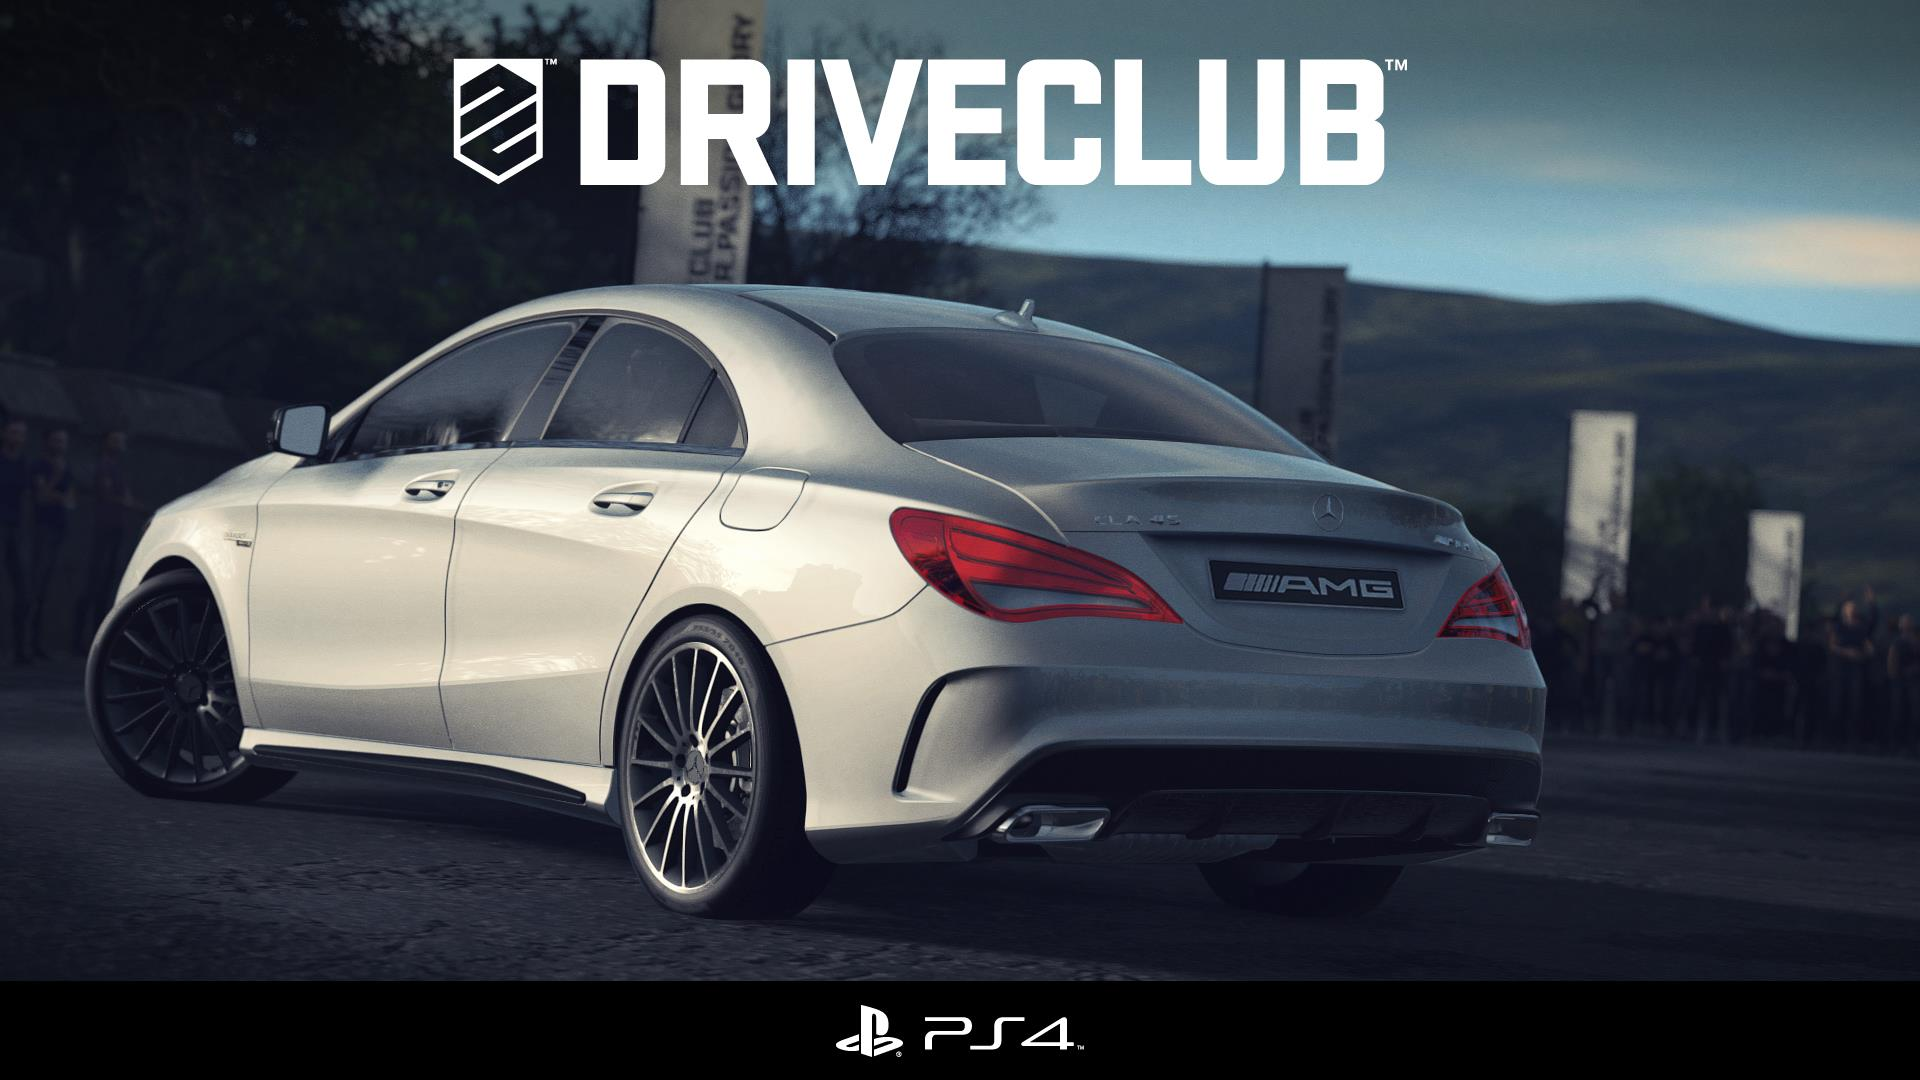 Evolution Studios announces Drive Club for PS4